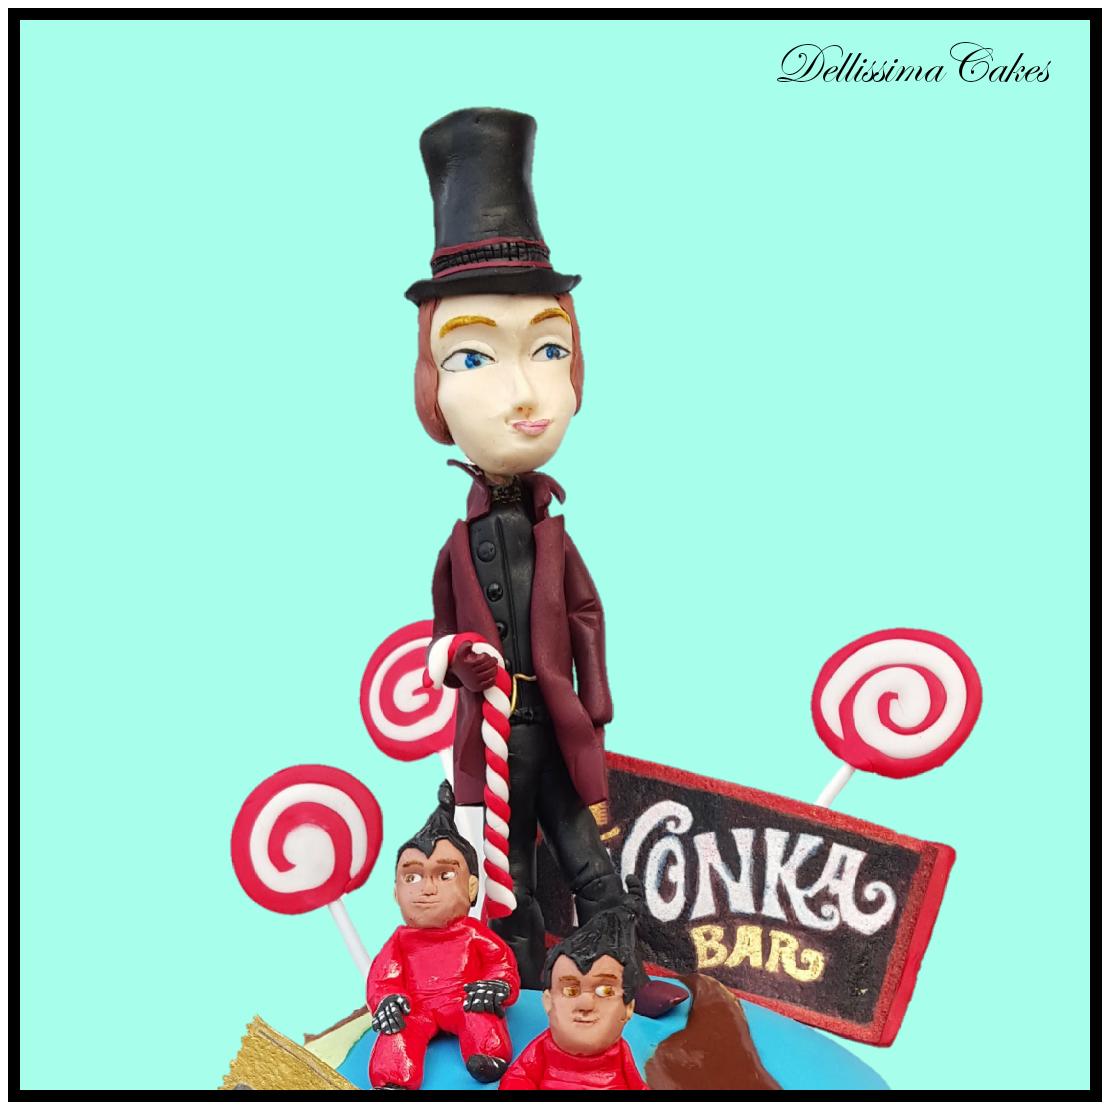 Willy-Wonka-Birthday-Cake-6.png